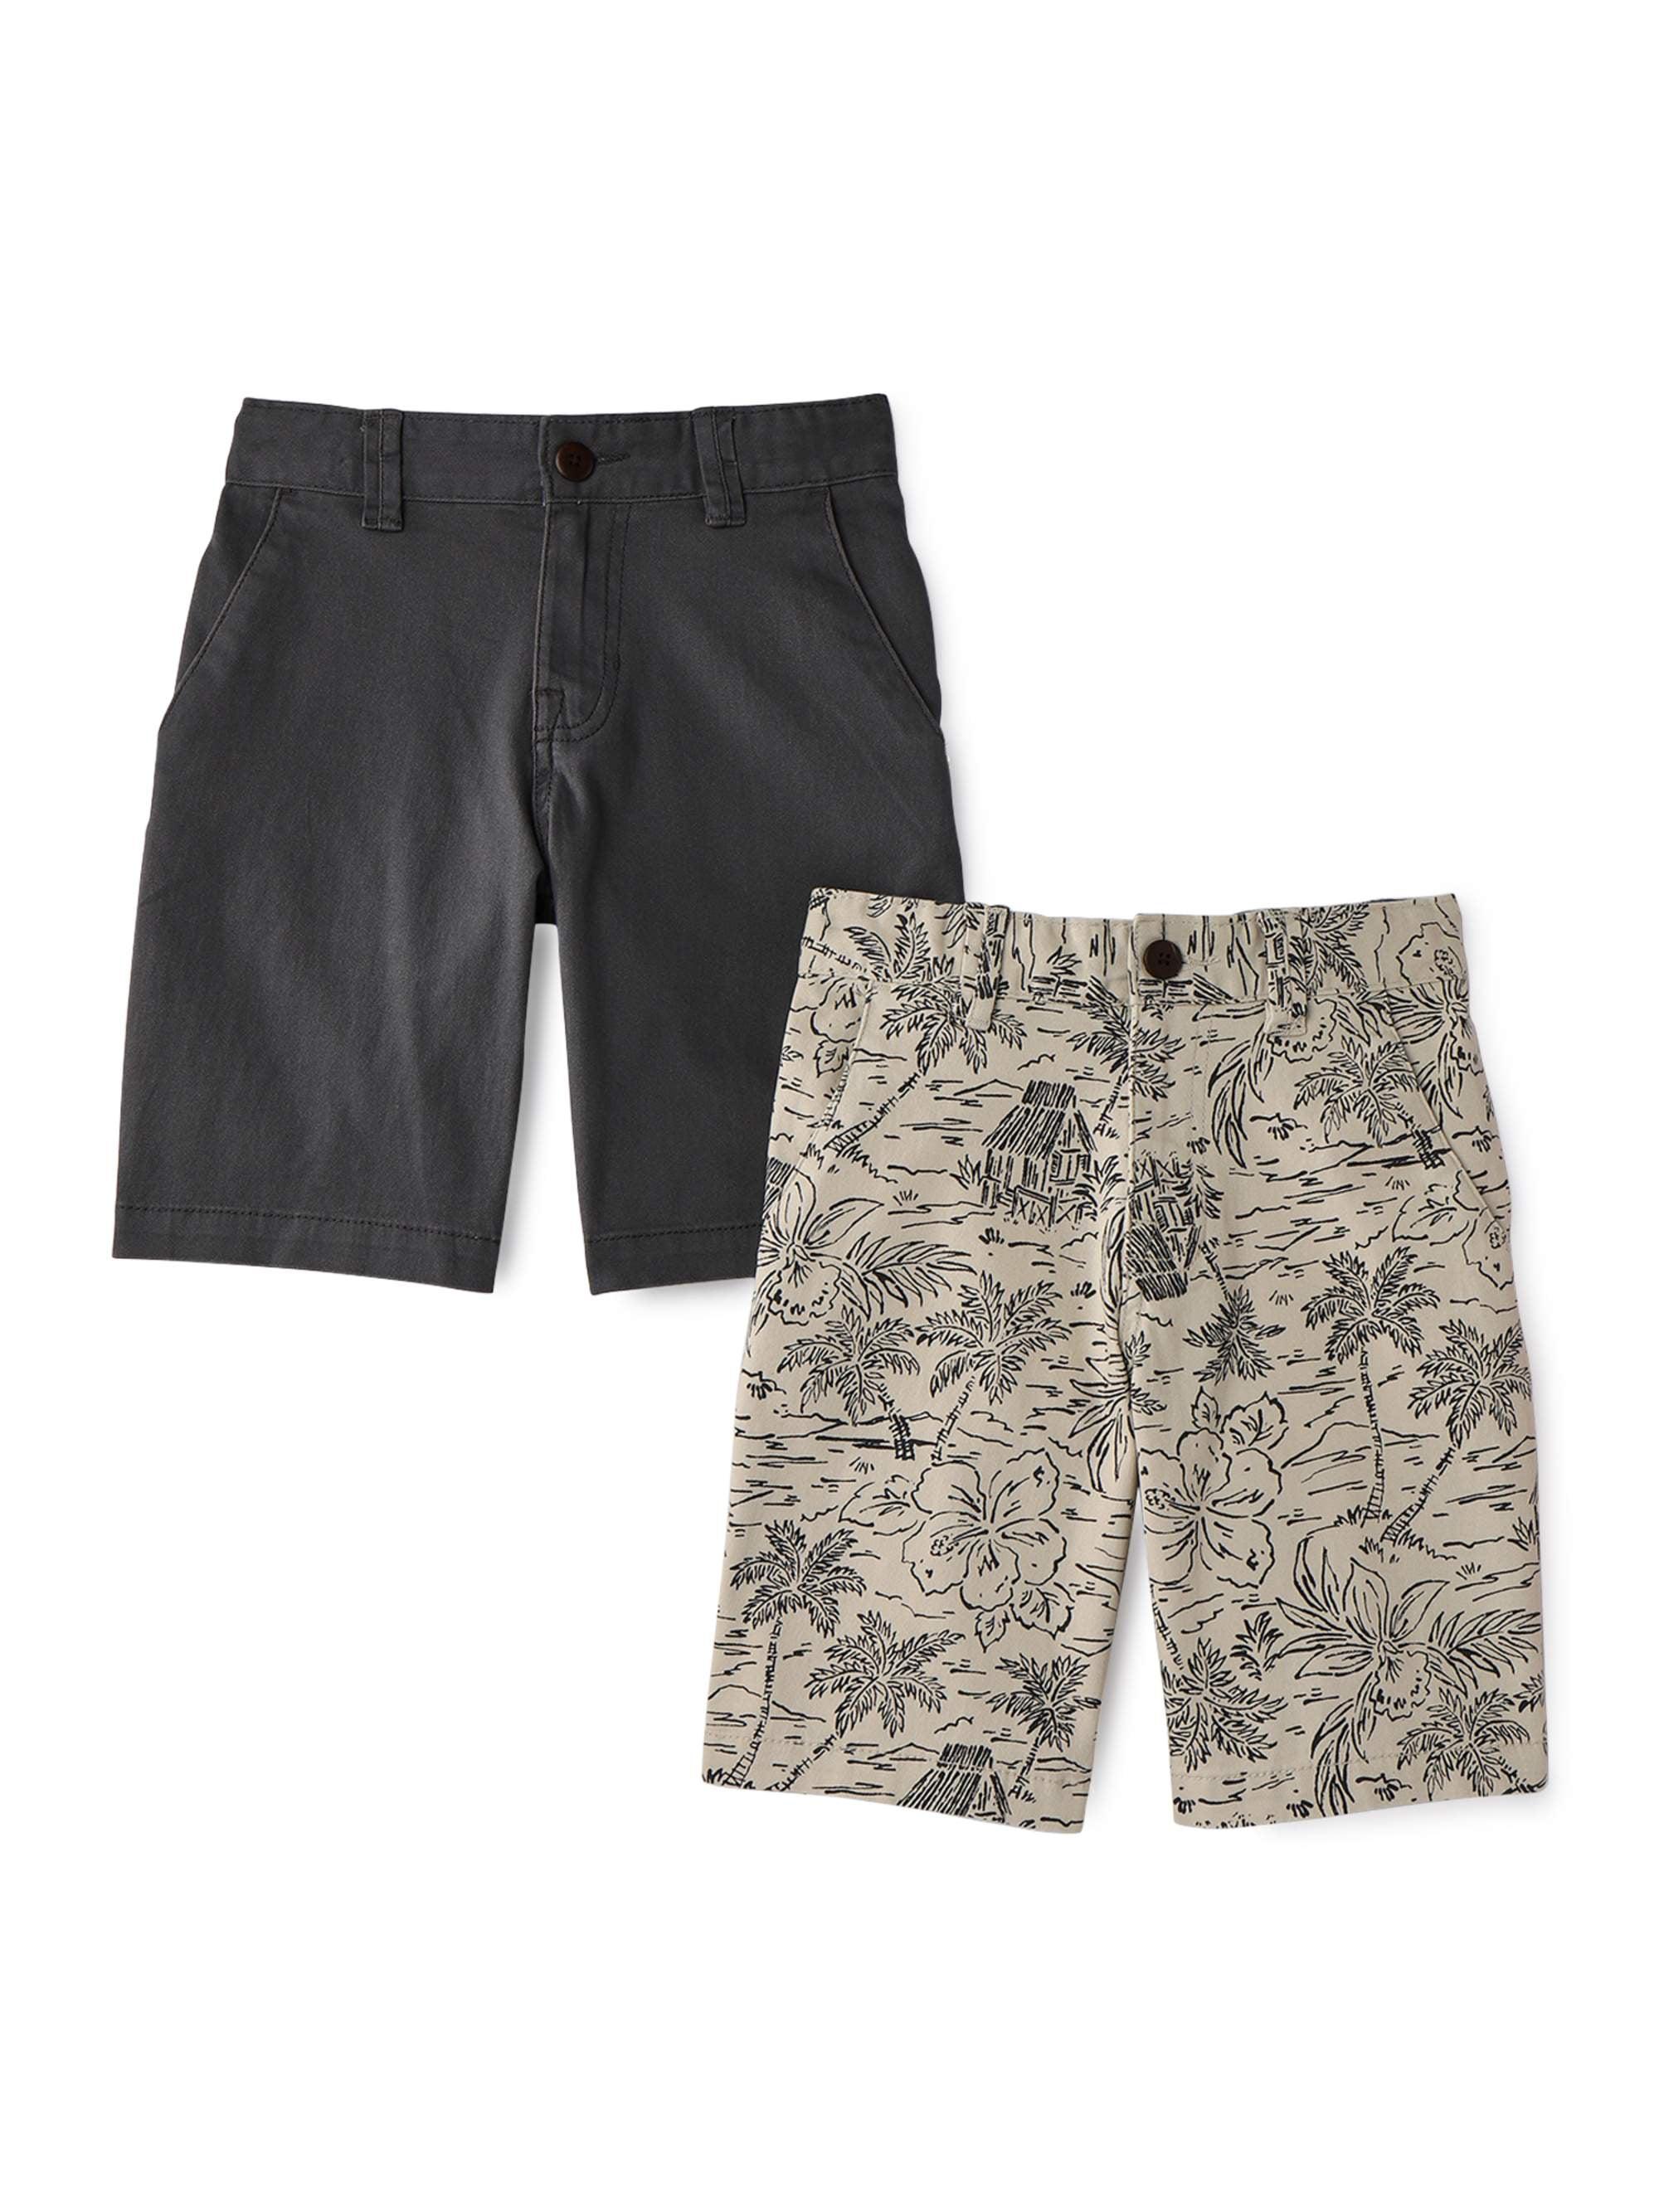 Boys Kids Shorts Fleece Summer Fashion Black Navy Grey